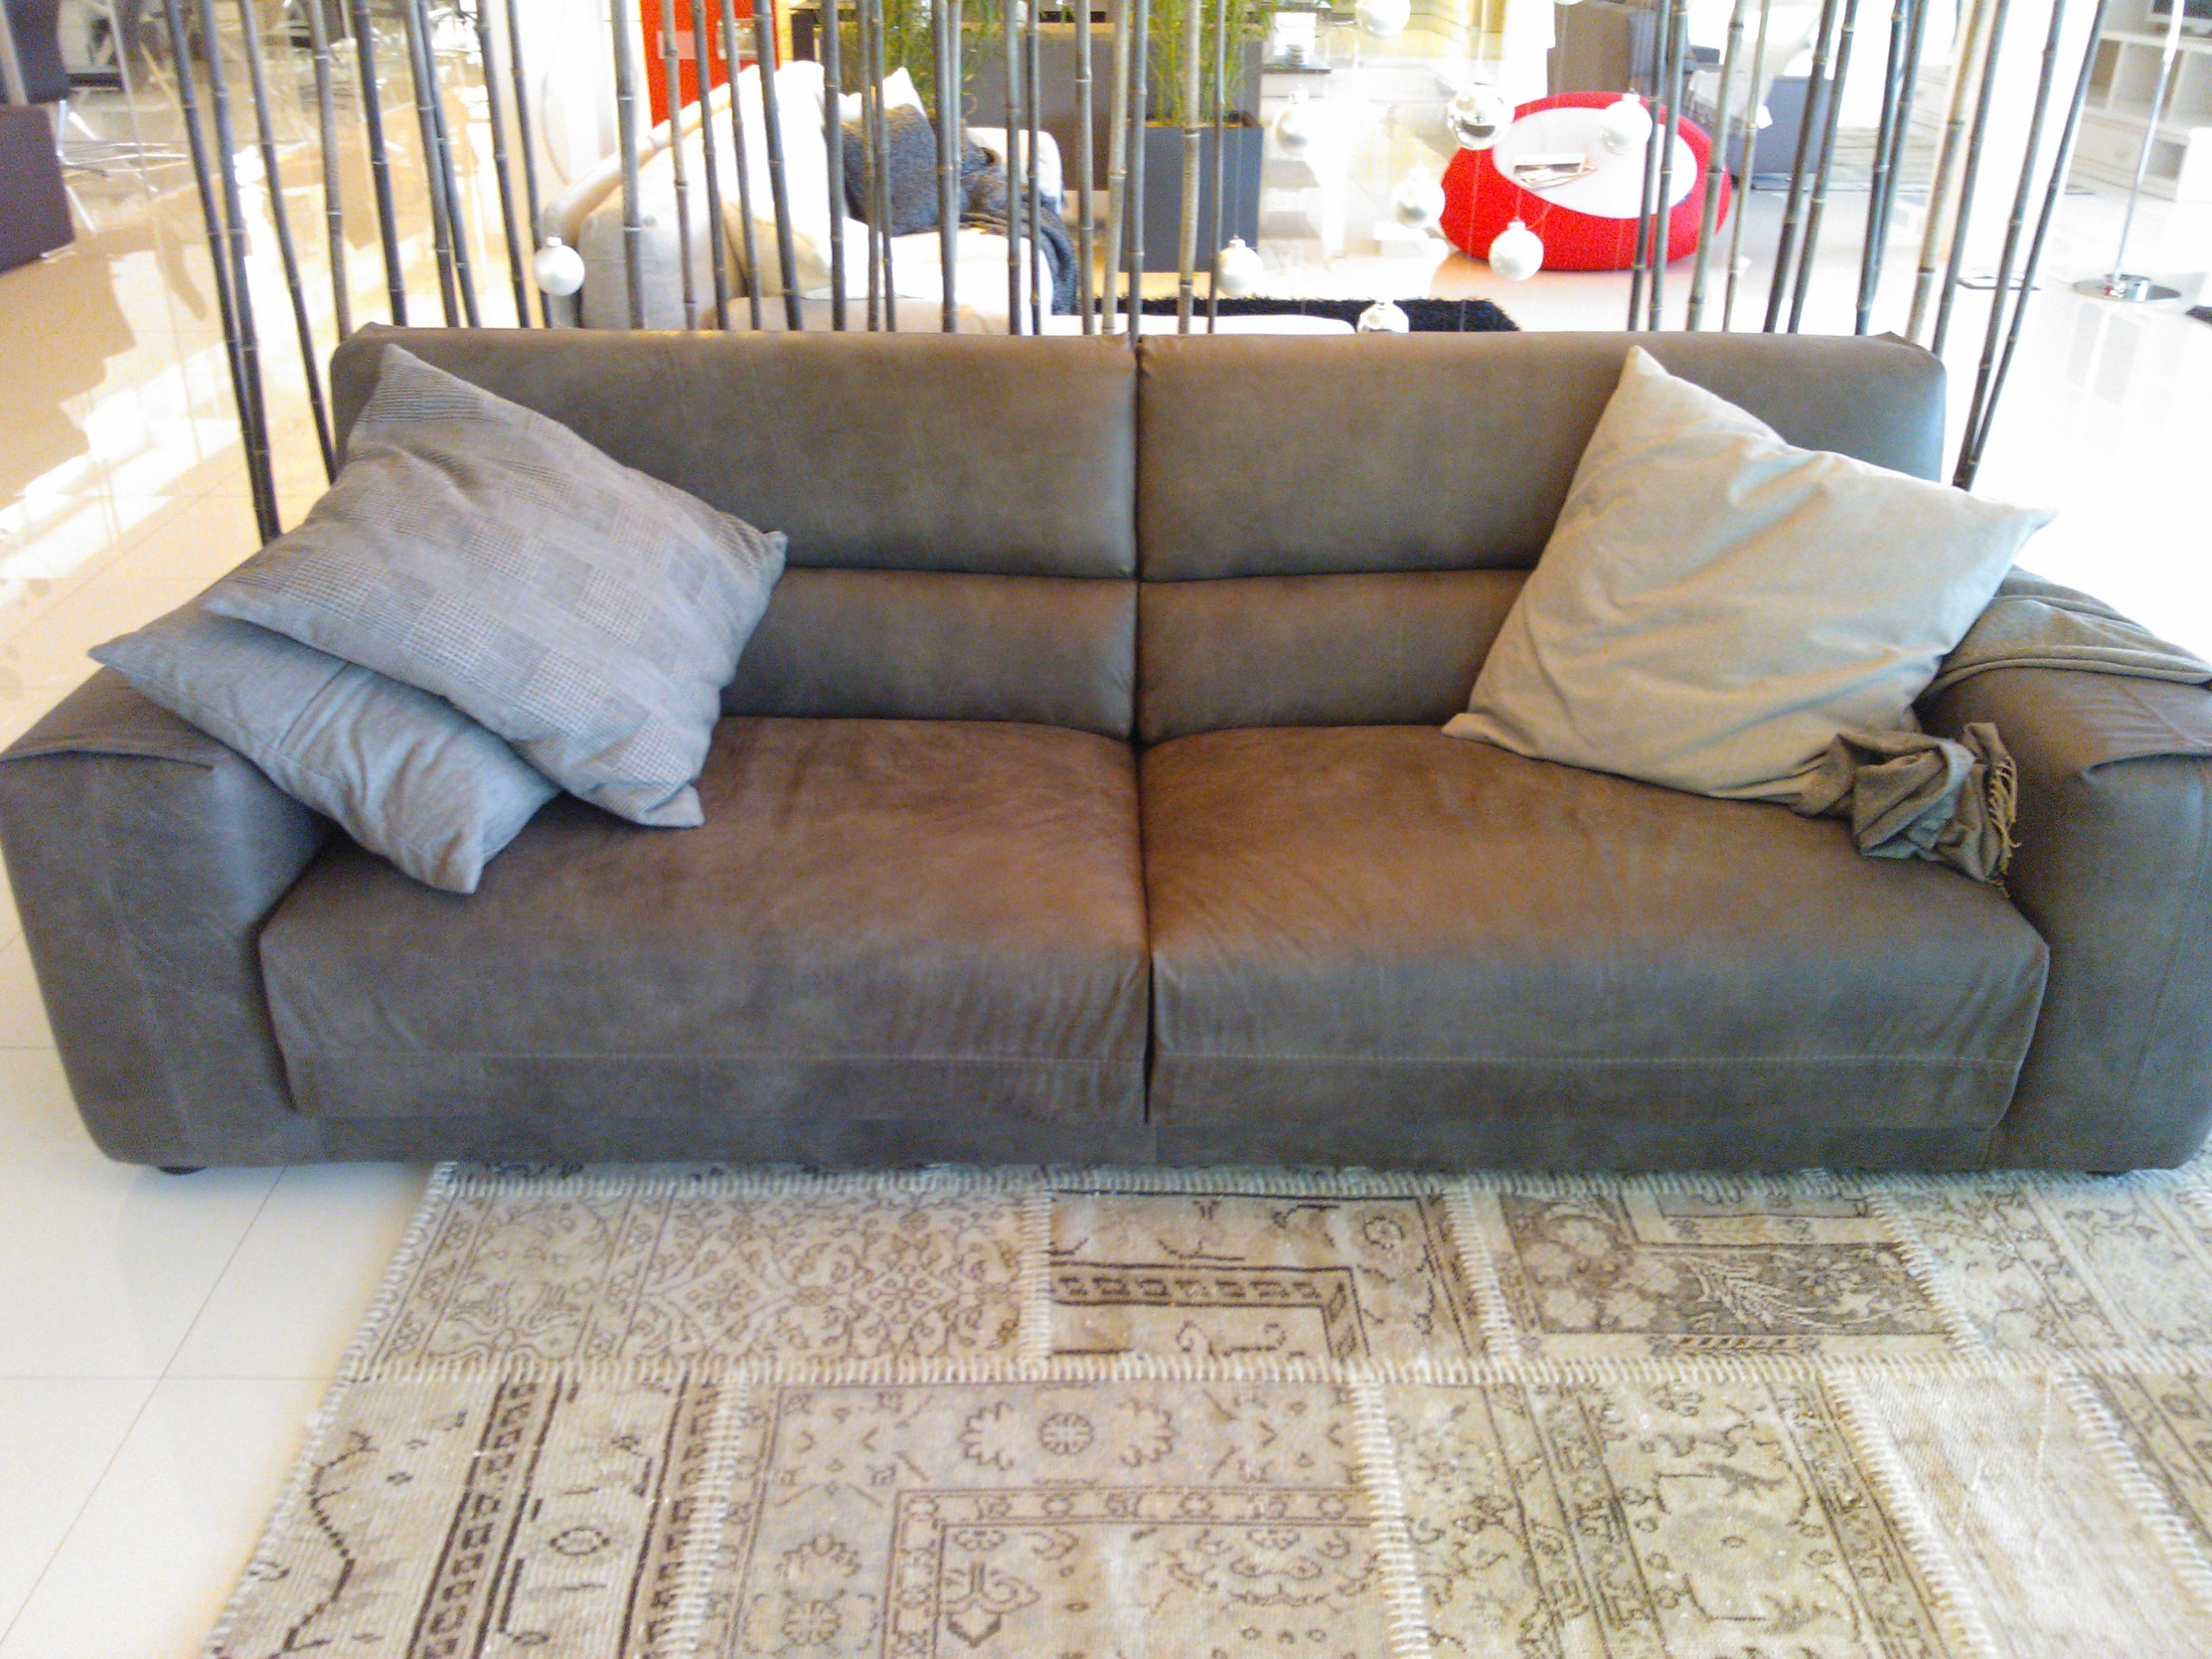 Divano ditreitalia outlet divani a prezzi scontati for Outlet divani